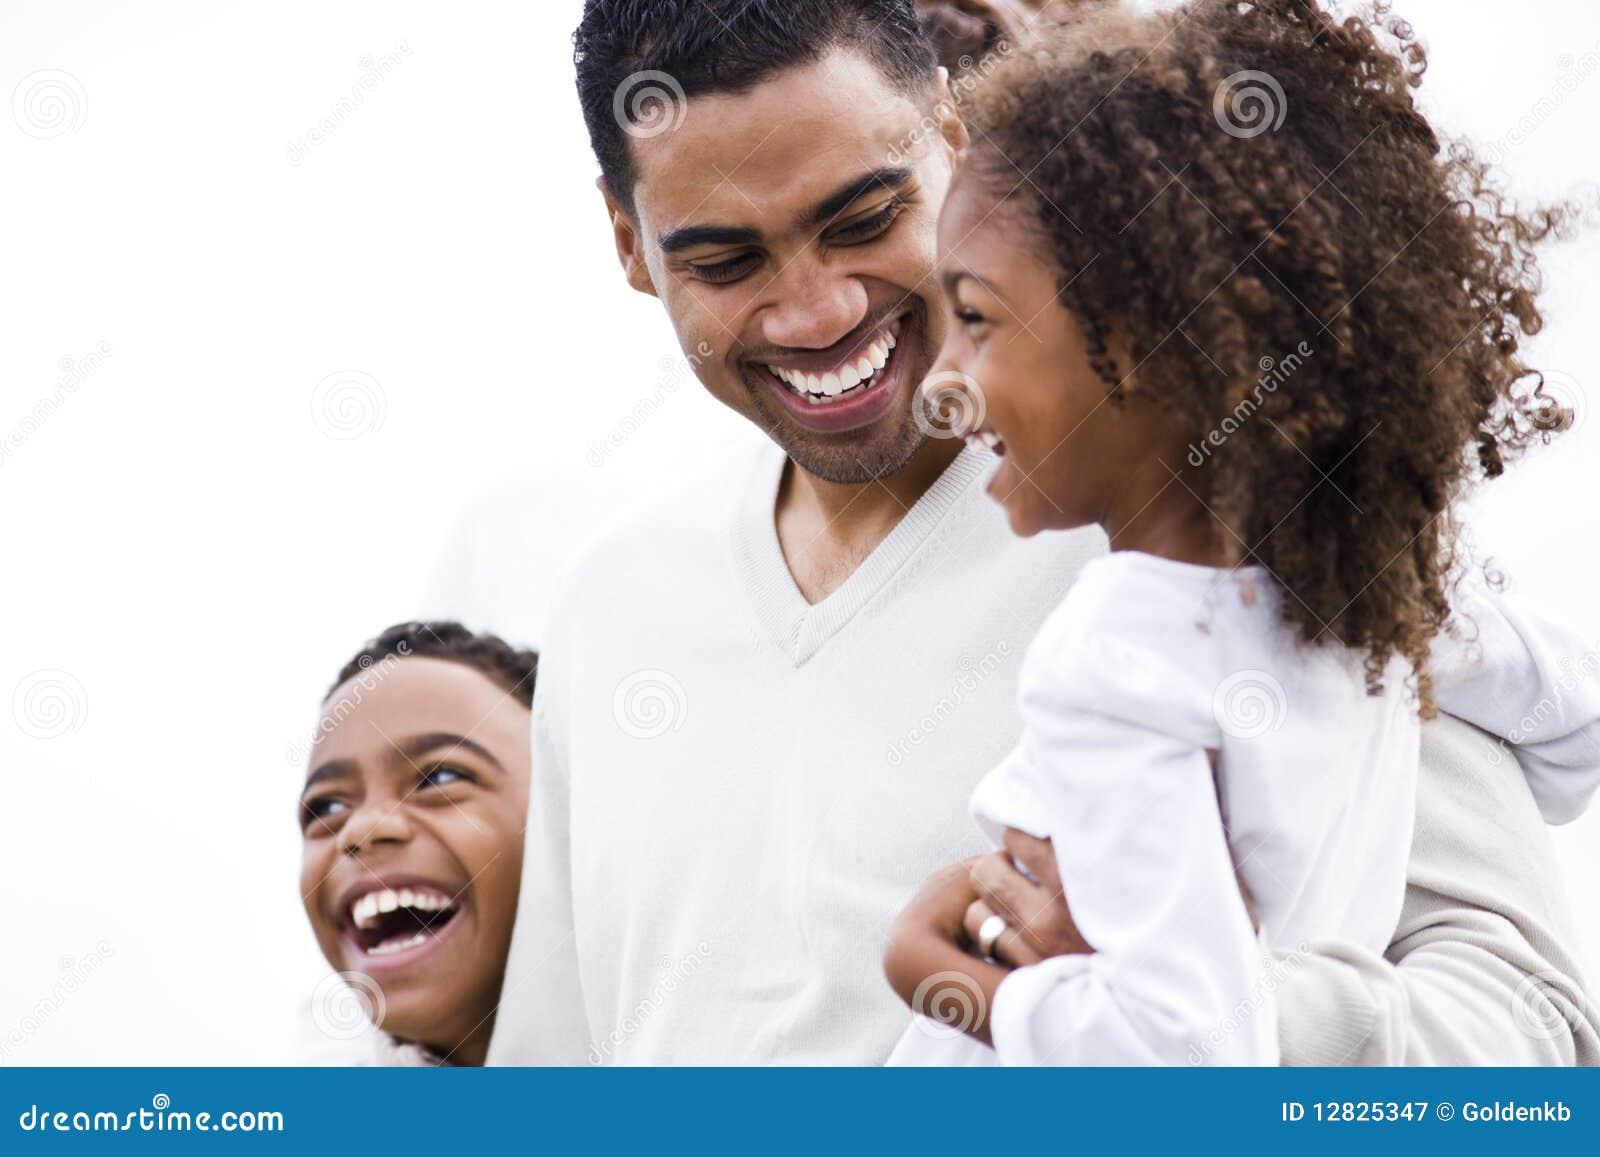 NahaufnahmeAfrican-Americanvater, der mit Kindern lacht